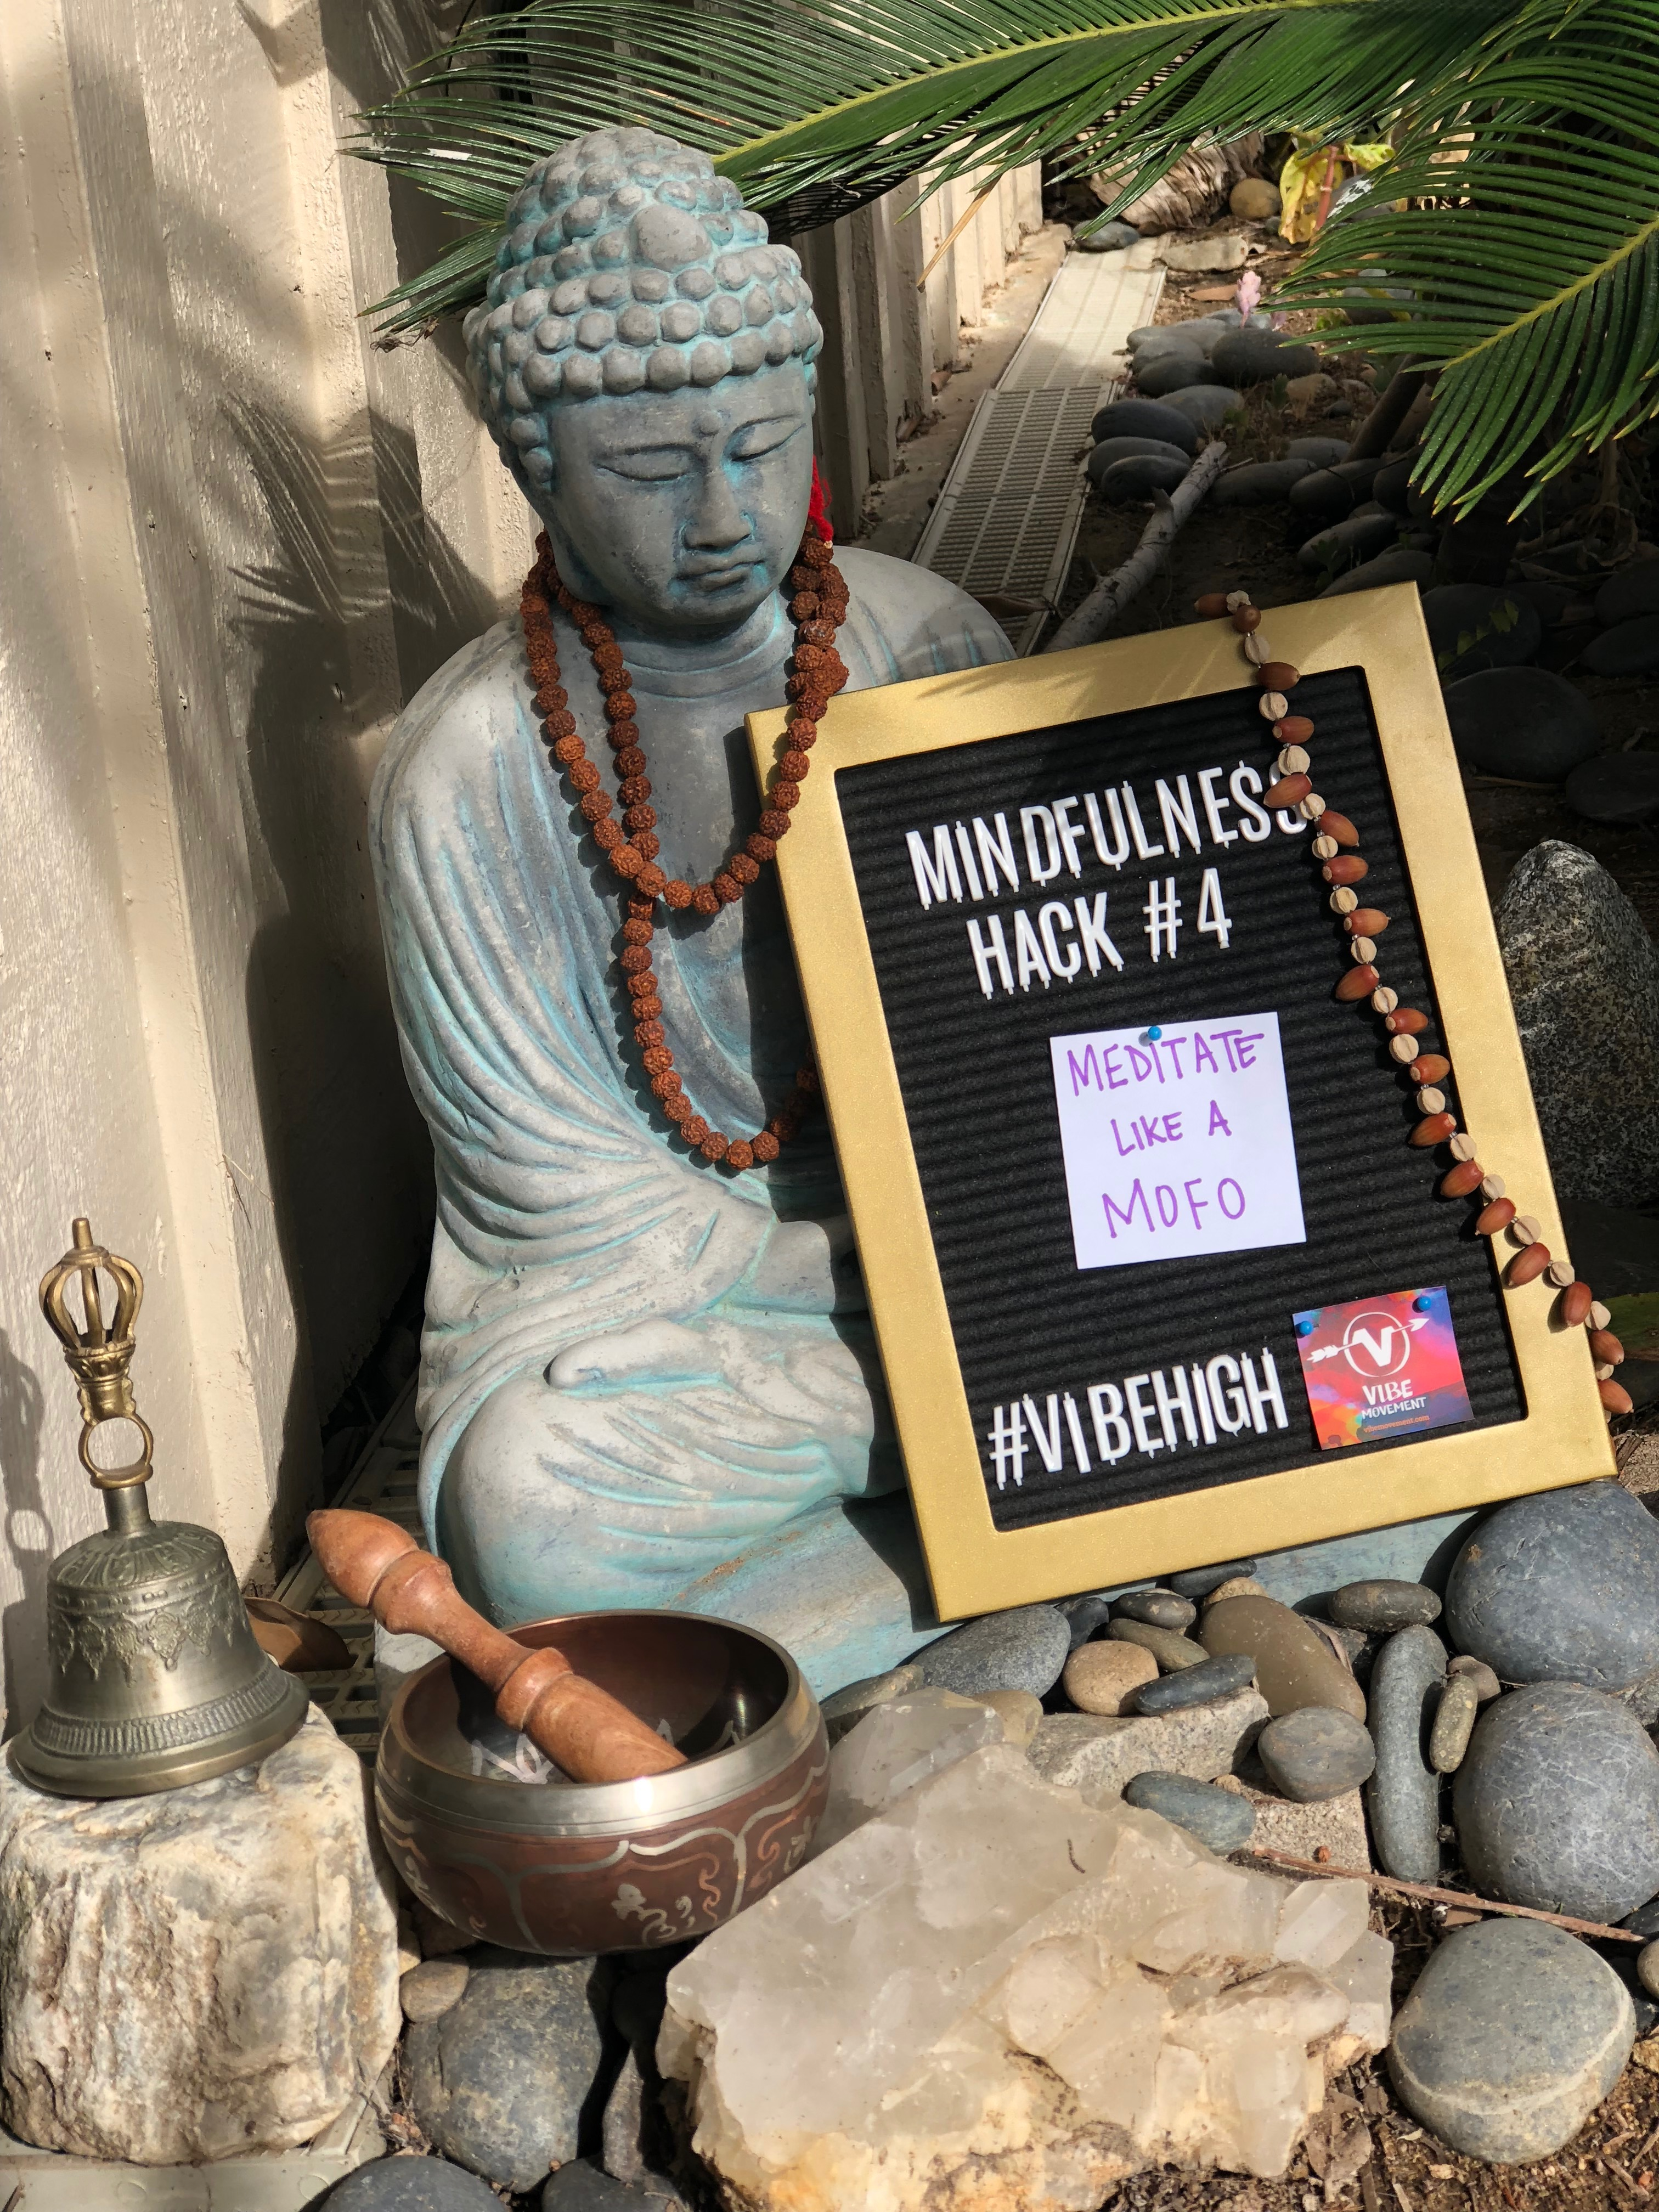 Mindfulness Hack 4: Meditate like a MoFo